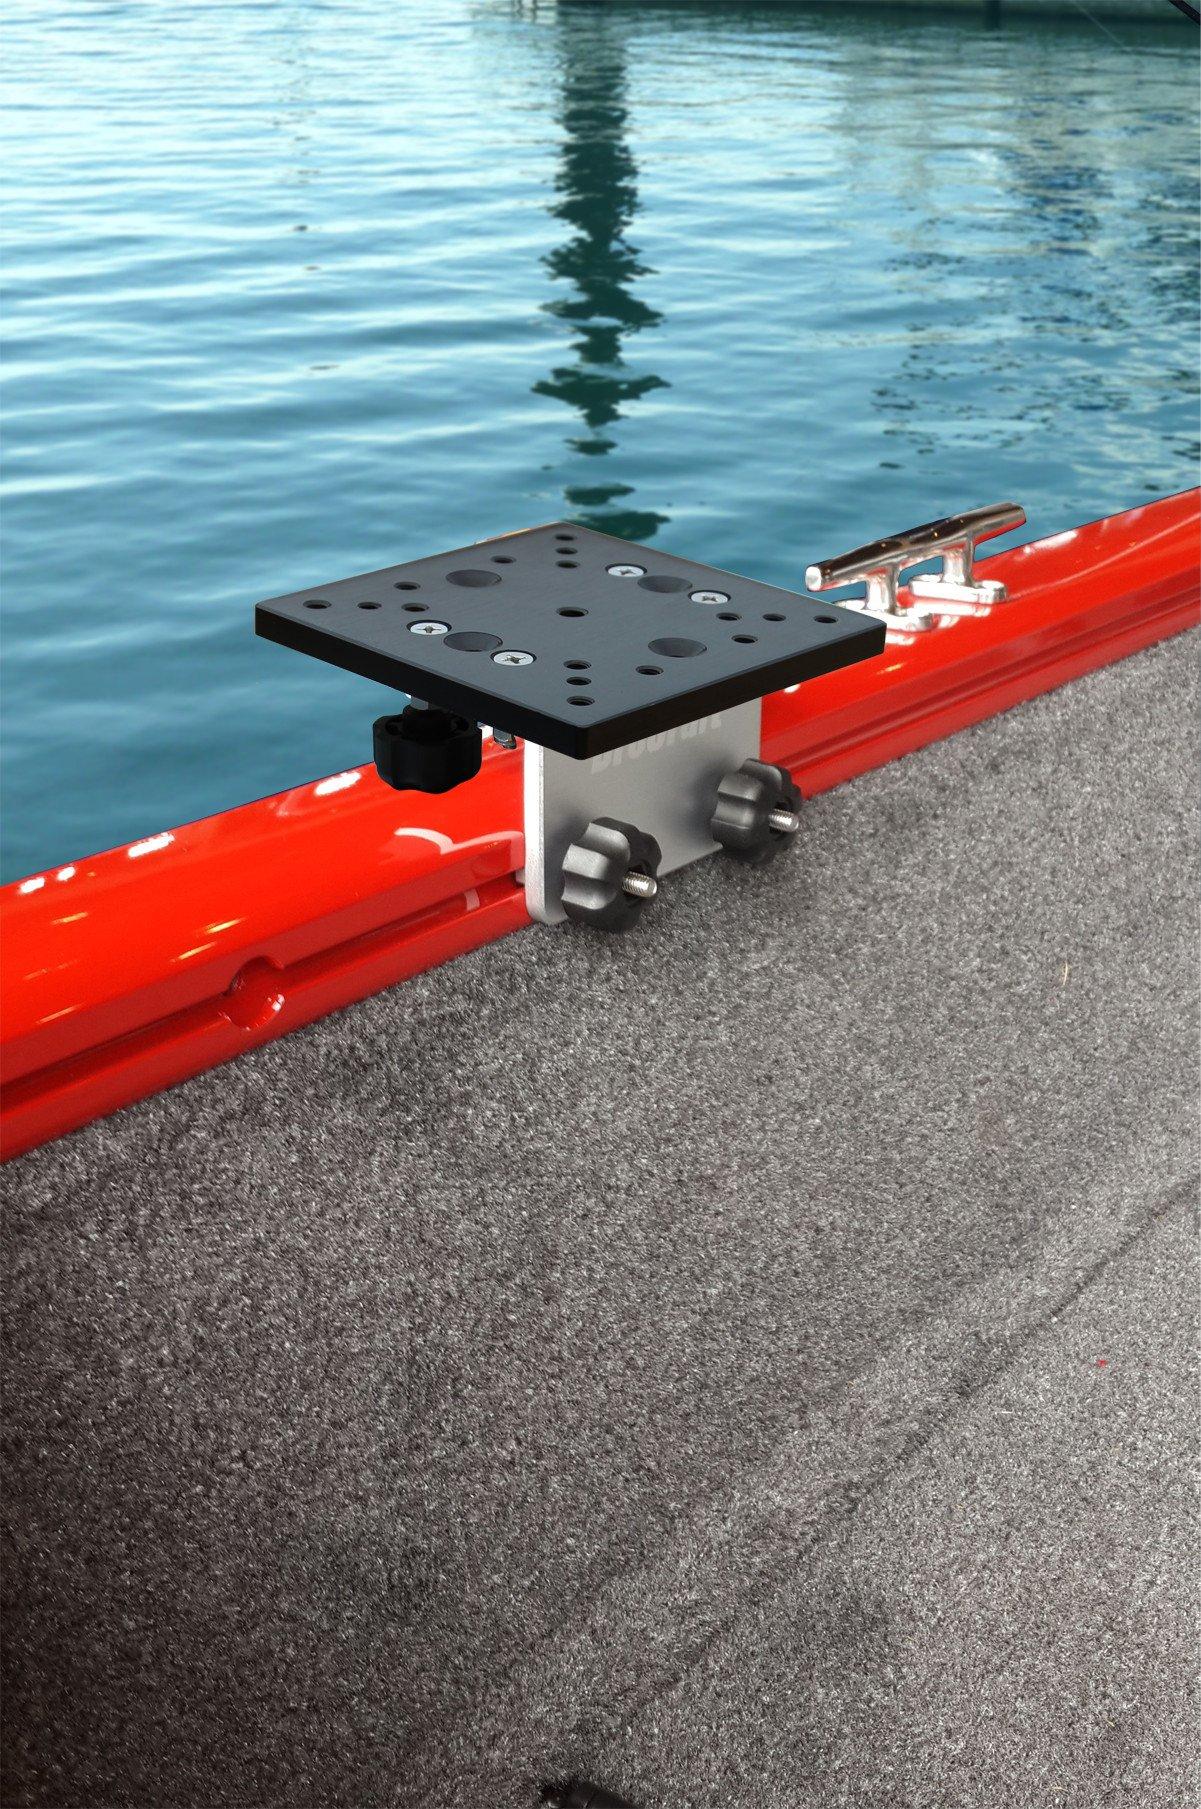 tracker boat accessories amazon combrocraft universal track bracket for tracker boat versatrack system lund sport track